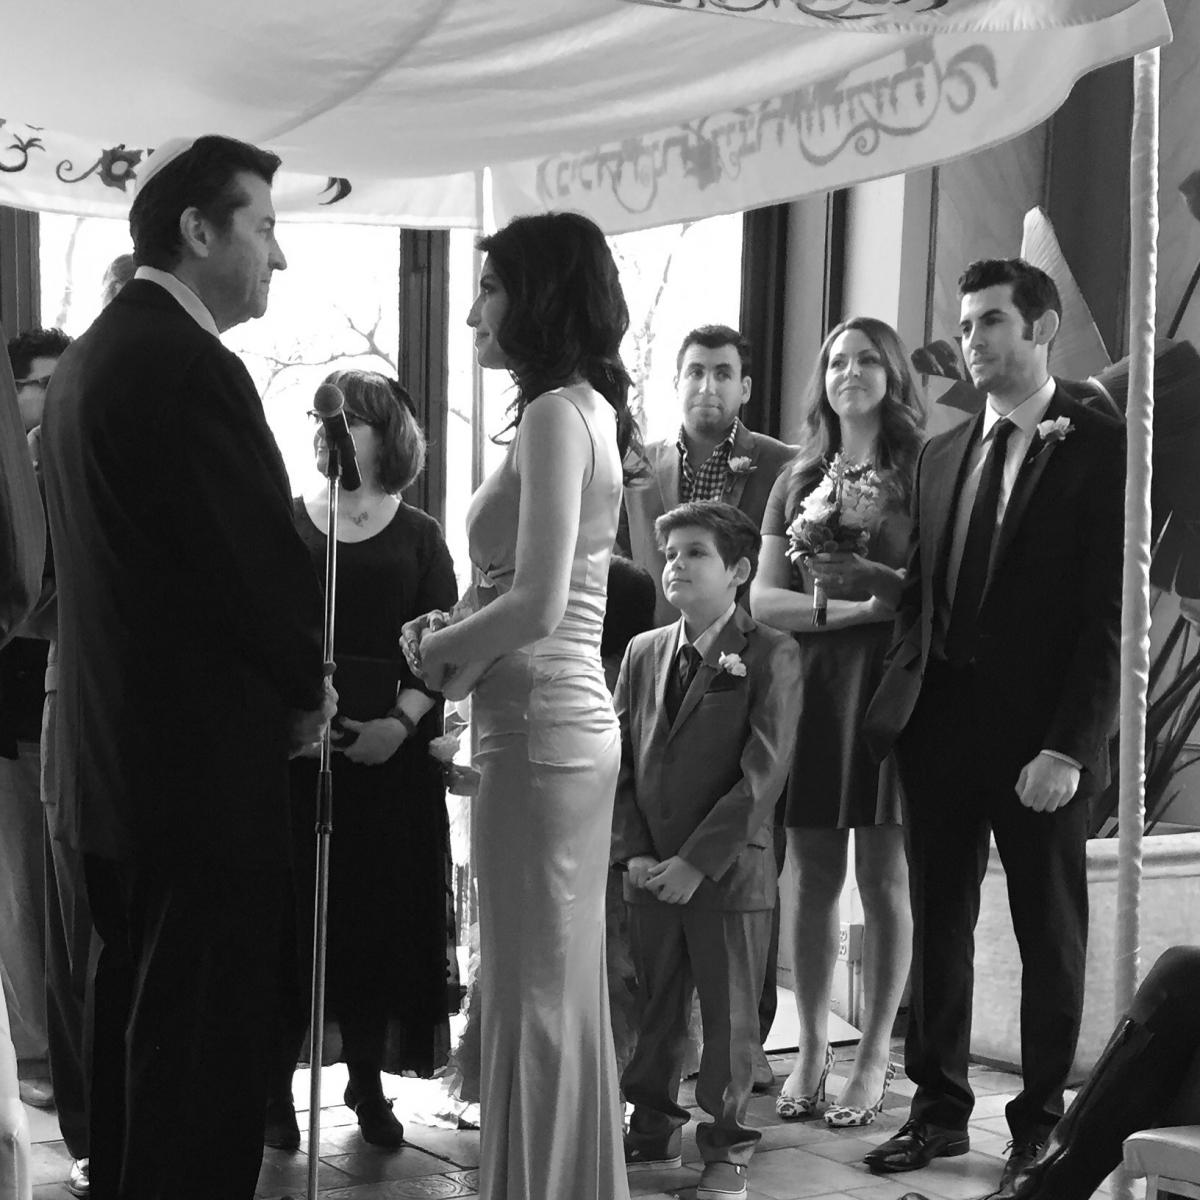 Jordana green's wedding ceremony